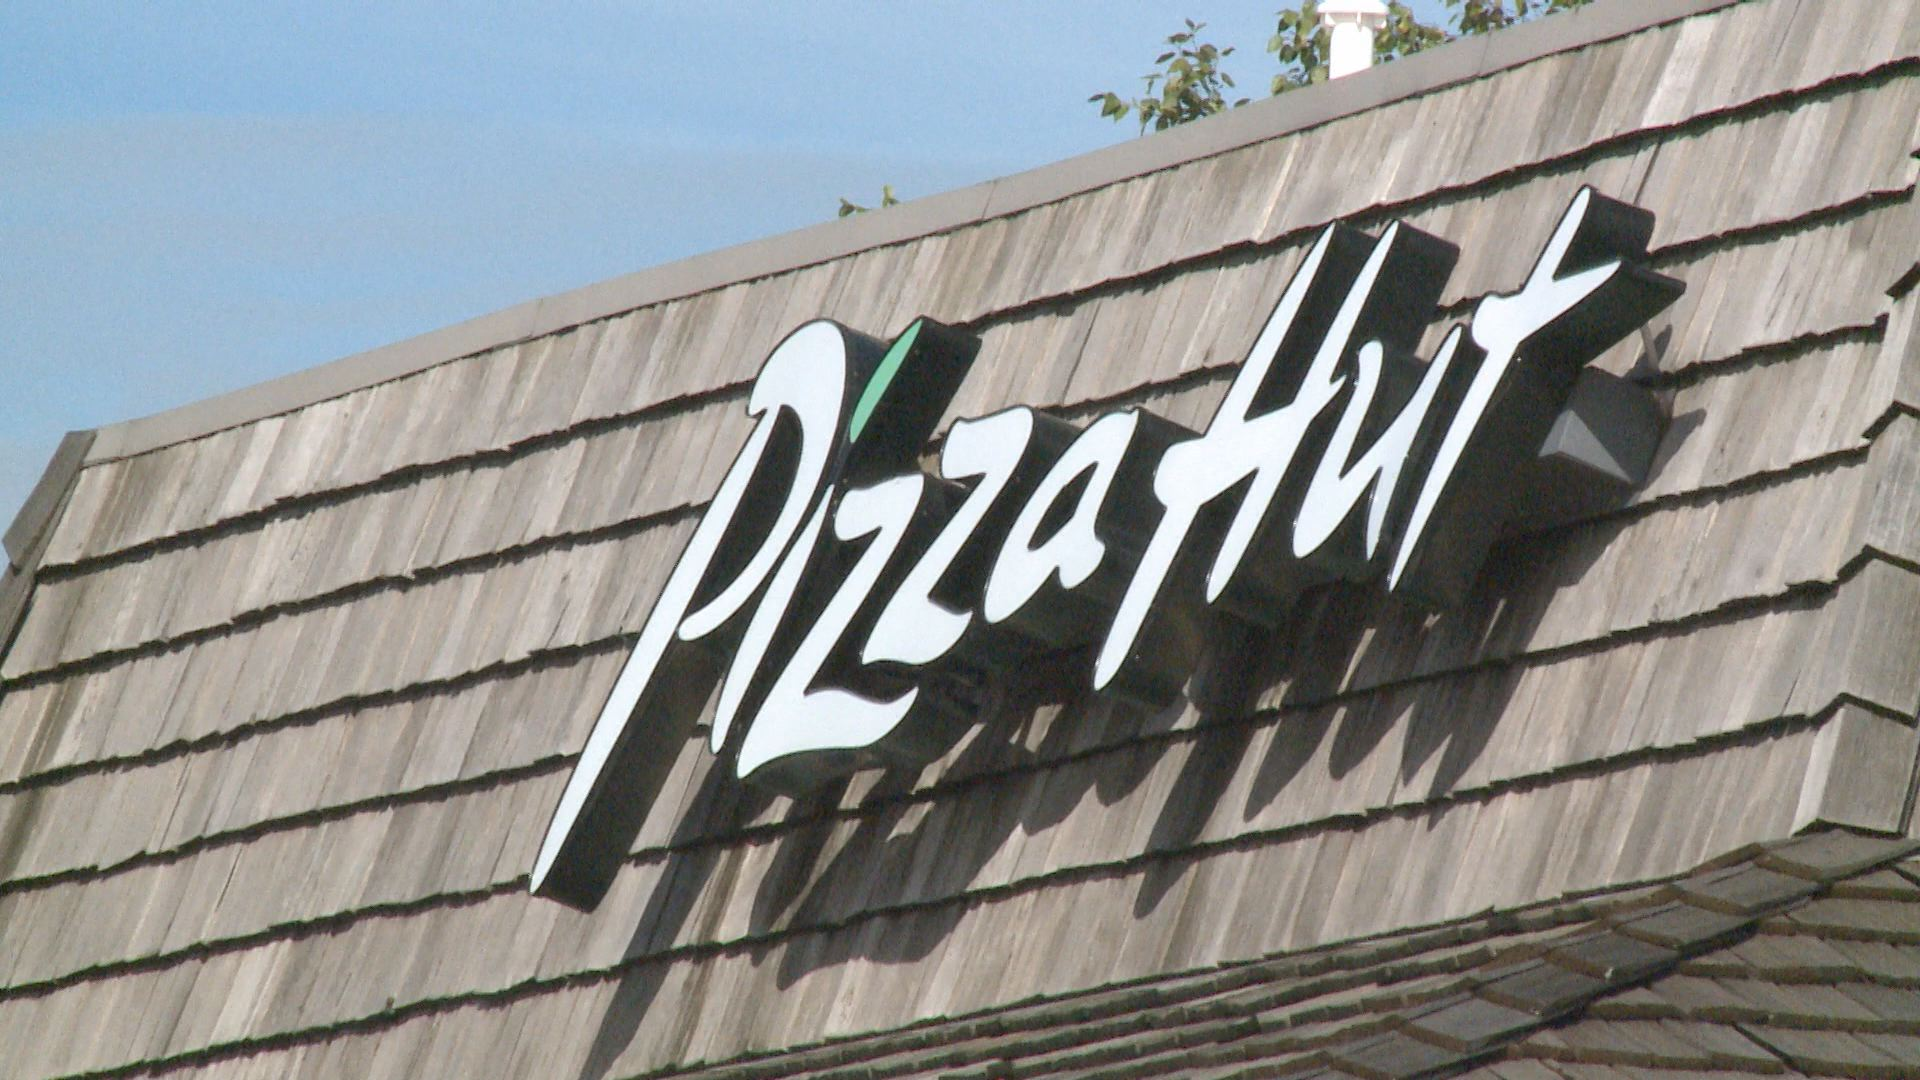 Pizza Hut Fort Wayne file 1_1523299077986.jpg.jpg